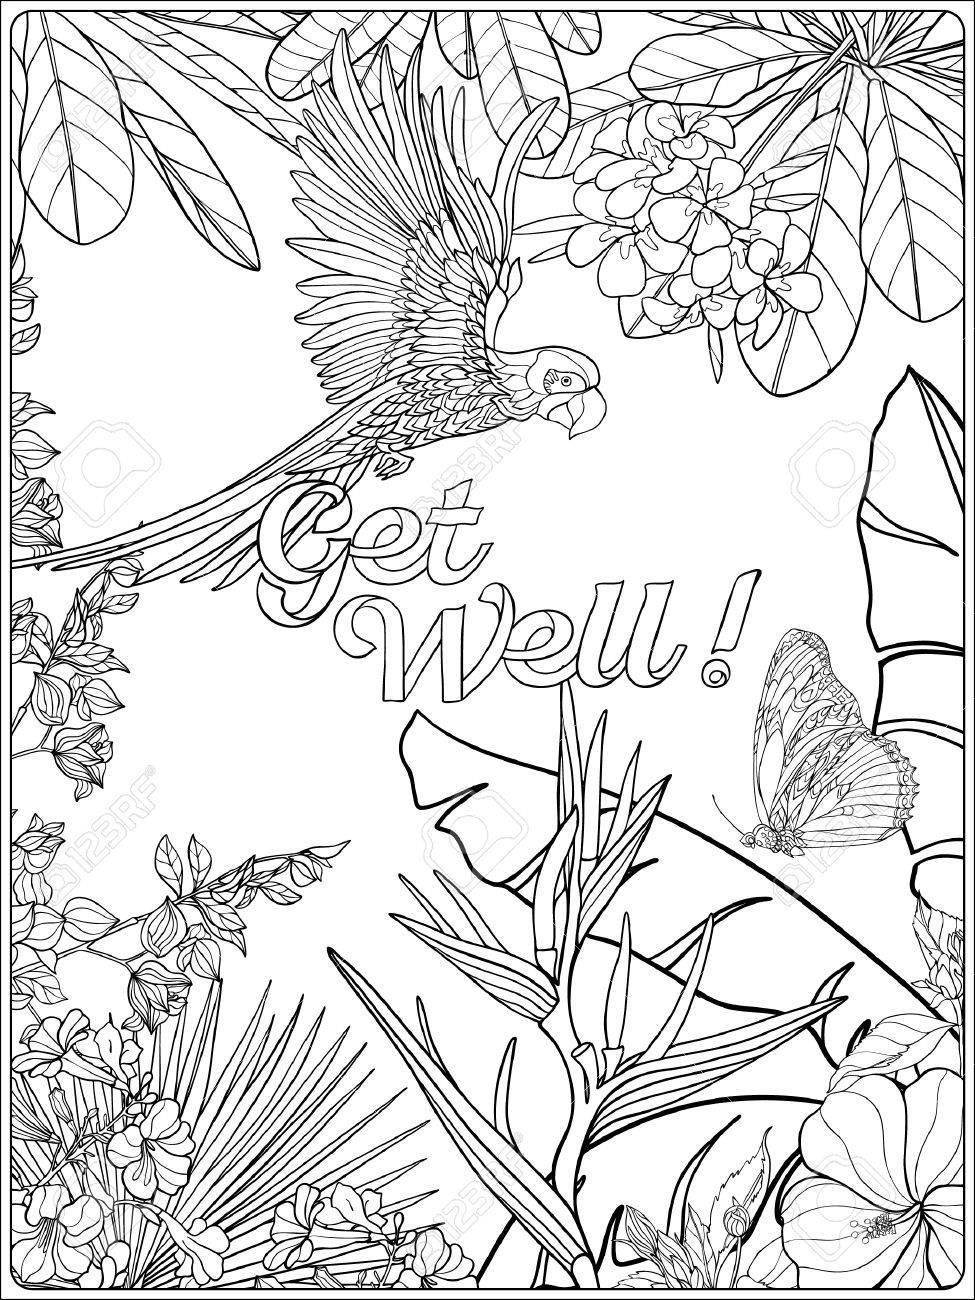 Tropical Wild Birds And Plants Tropical Garden Collection Coloring